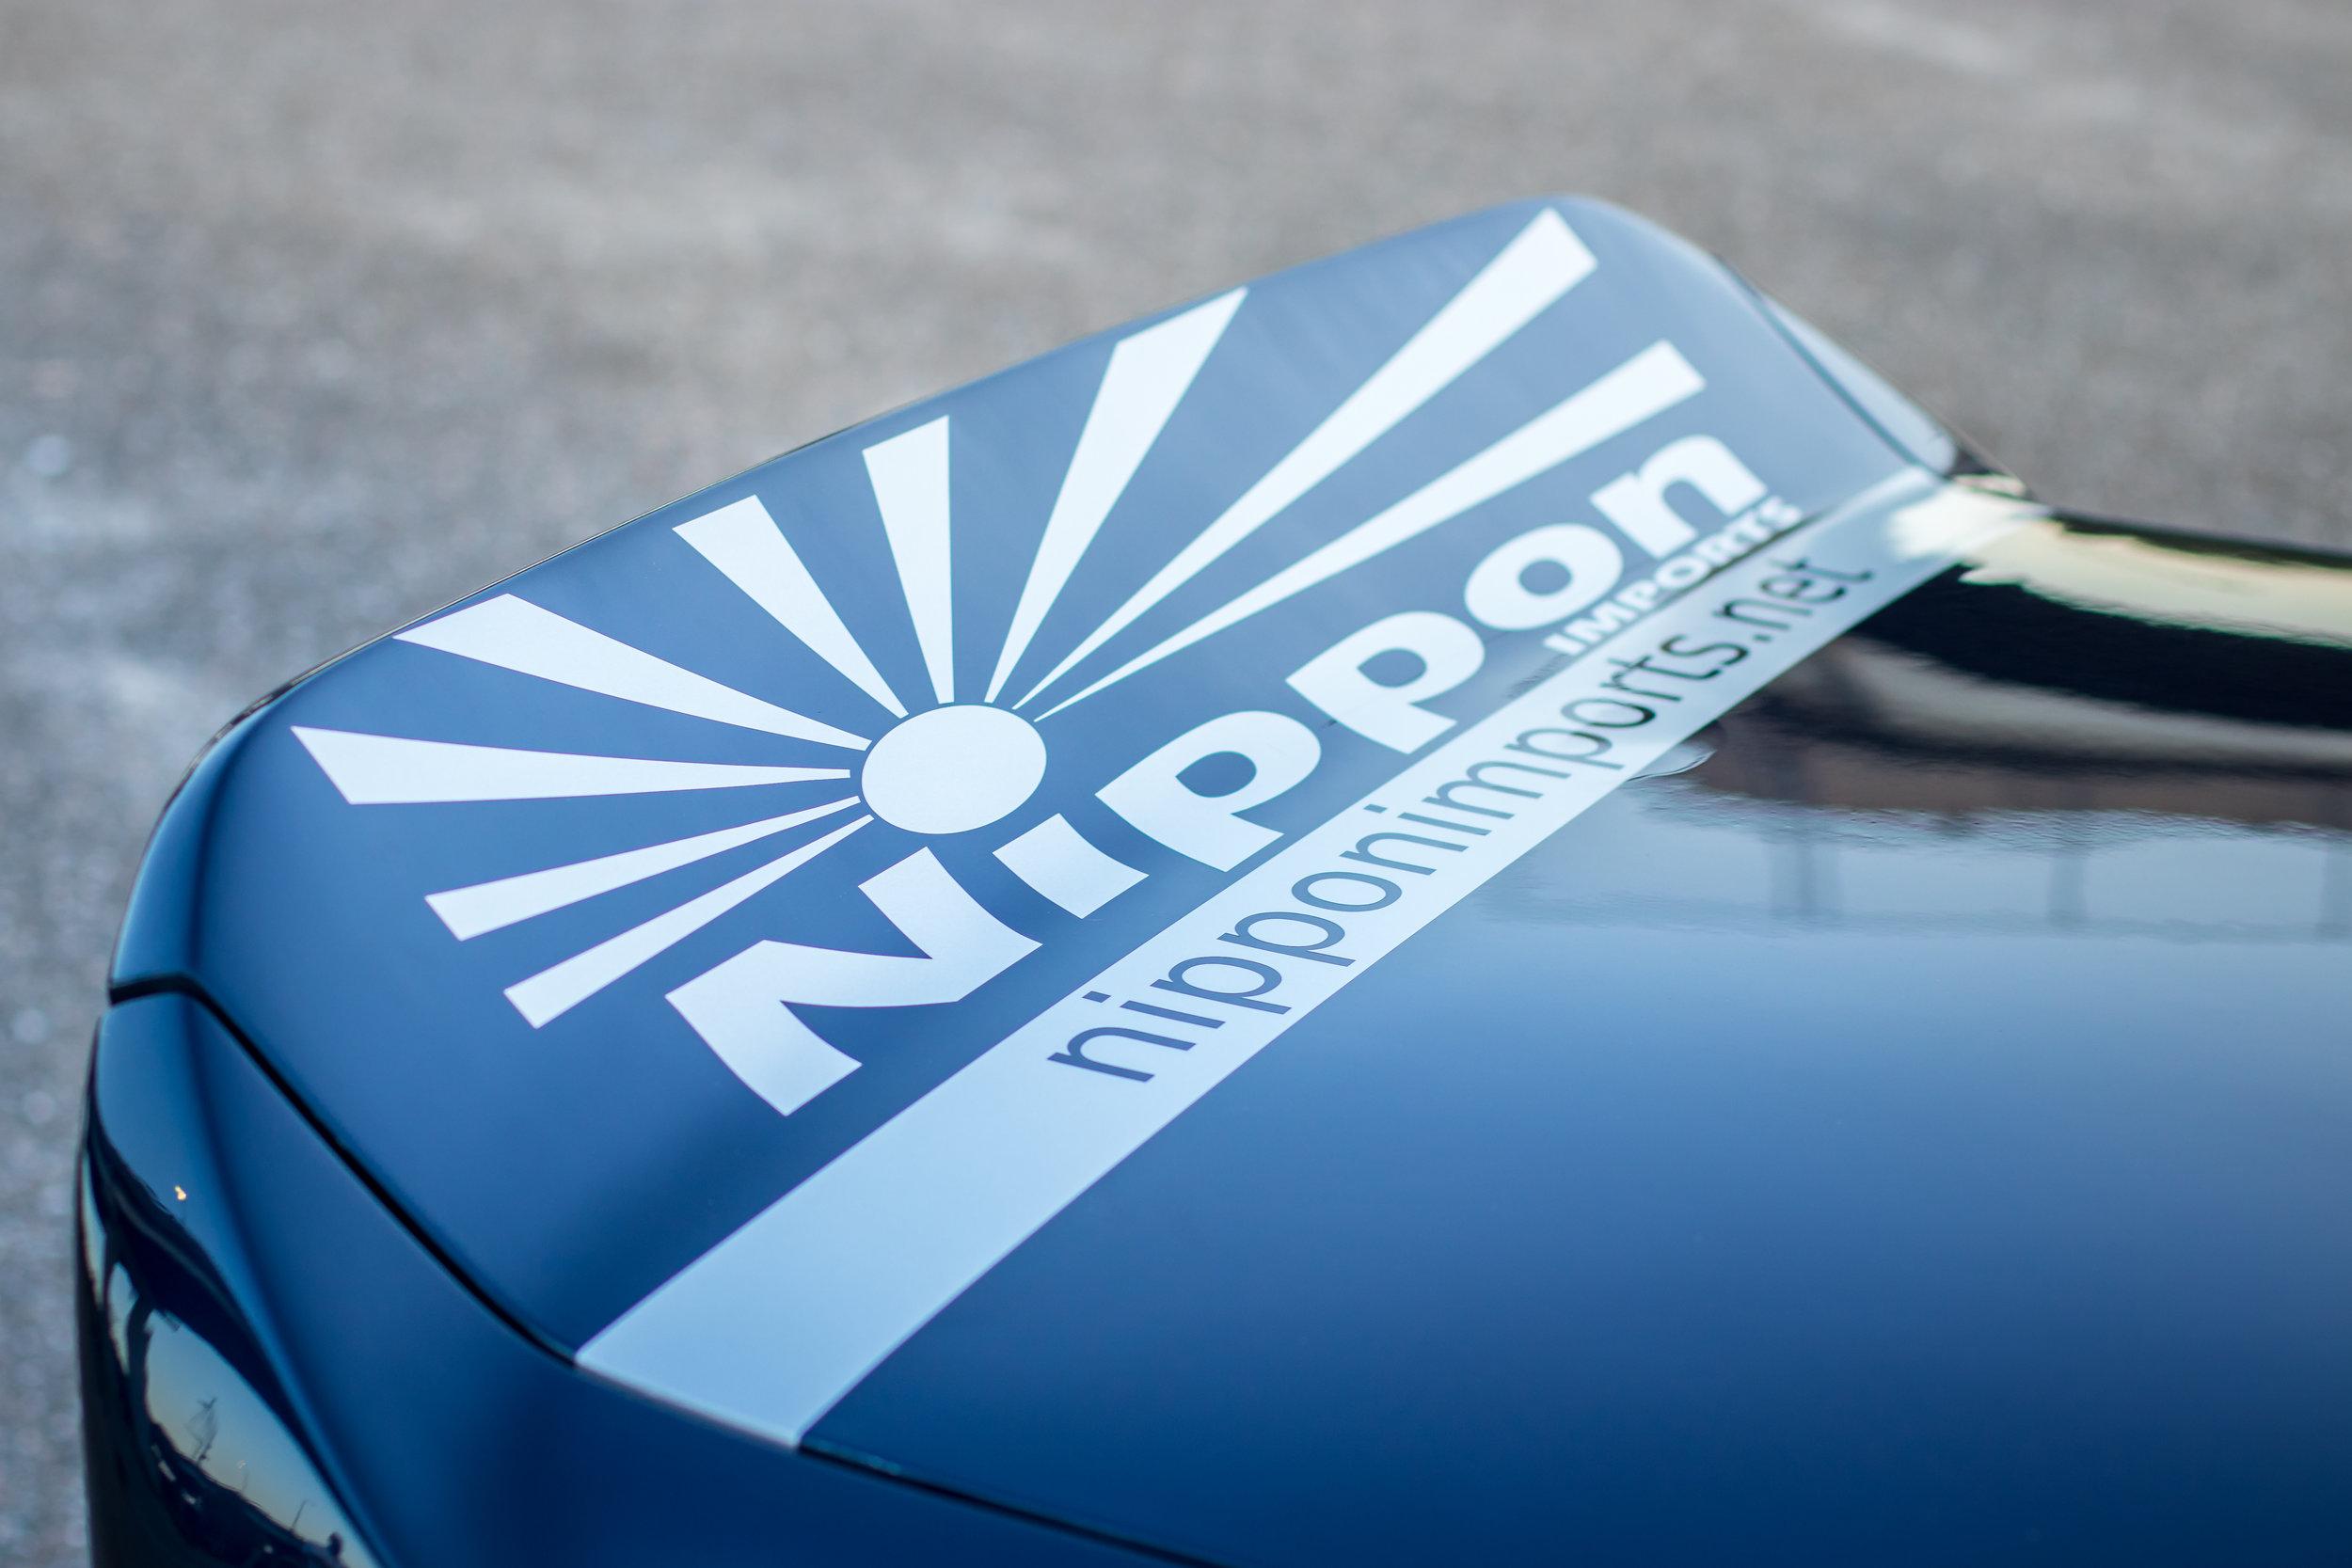 nippon-imports-toyota-crown_40176234240_o.jpg